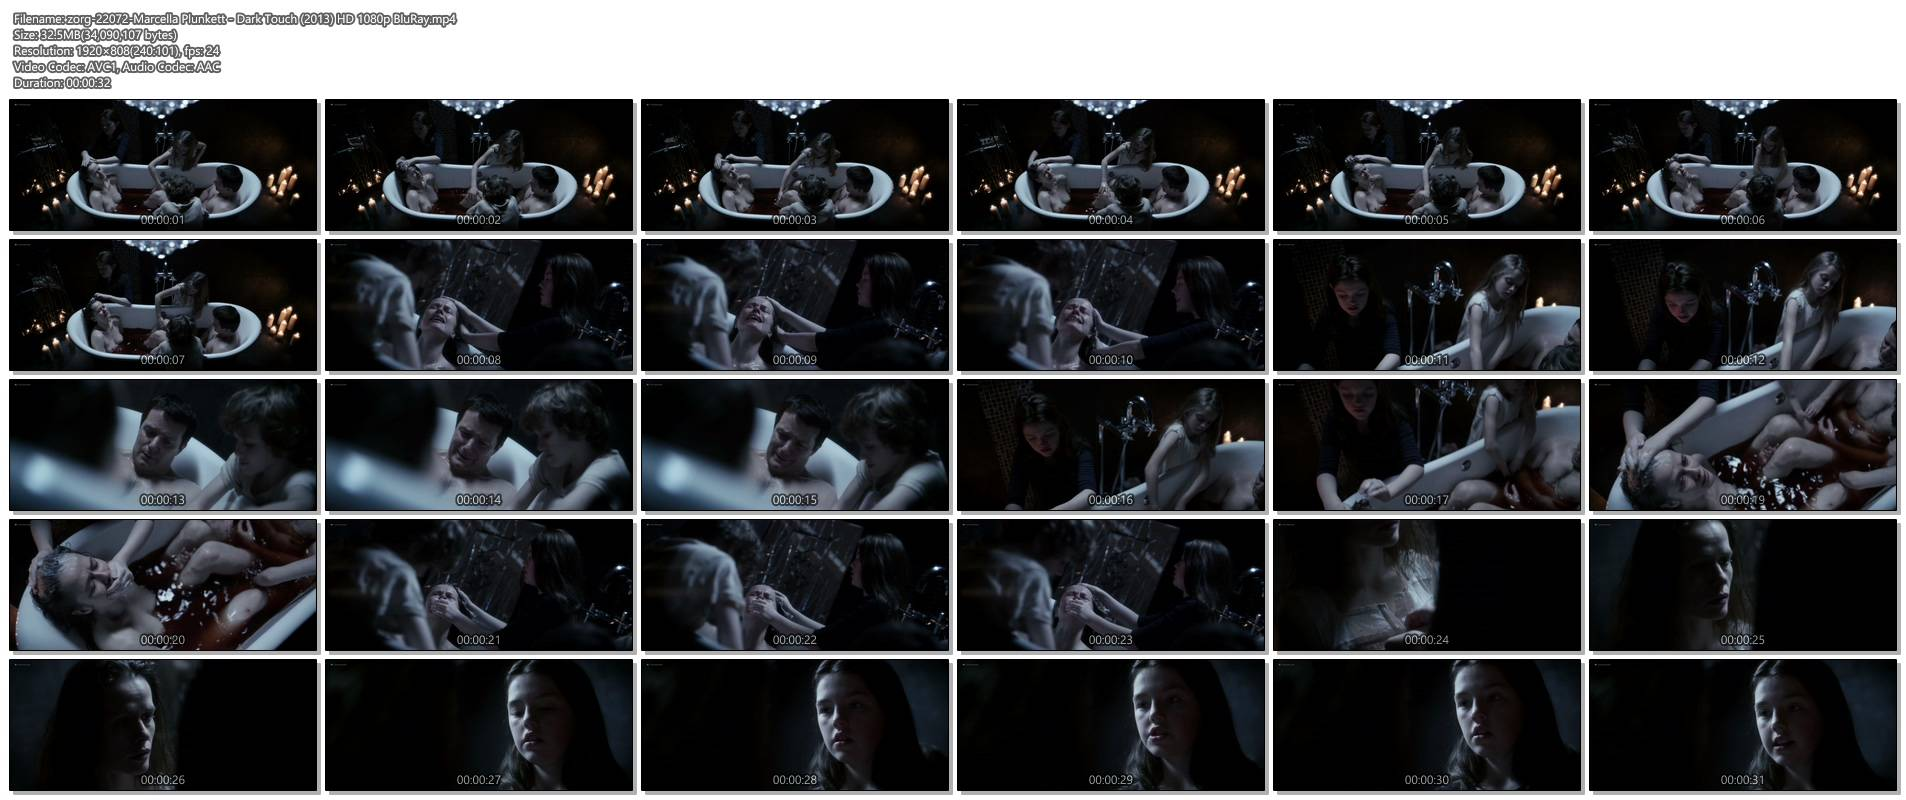 Marcella Plunkett nude topless in bath - Dark Touch (2013) HD 1080p BluRay (1)